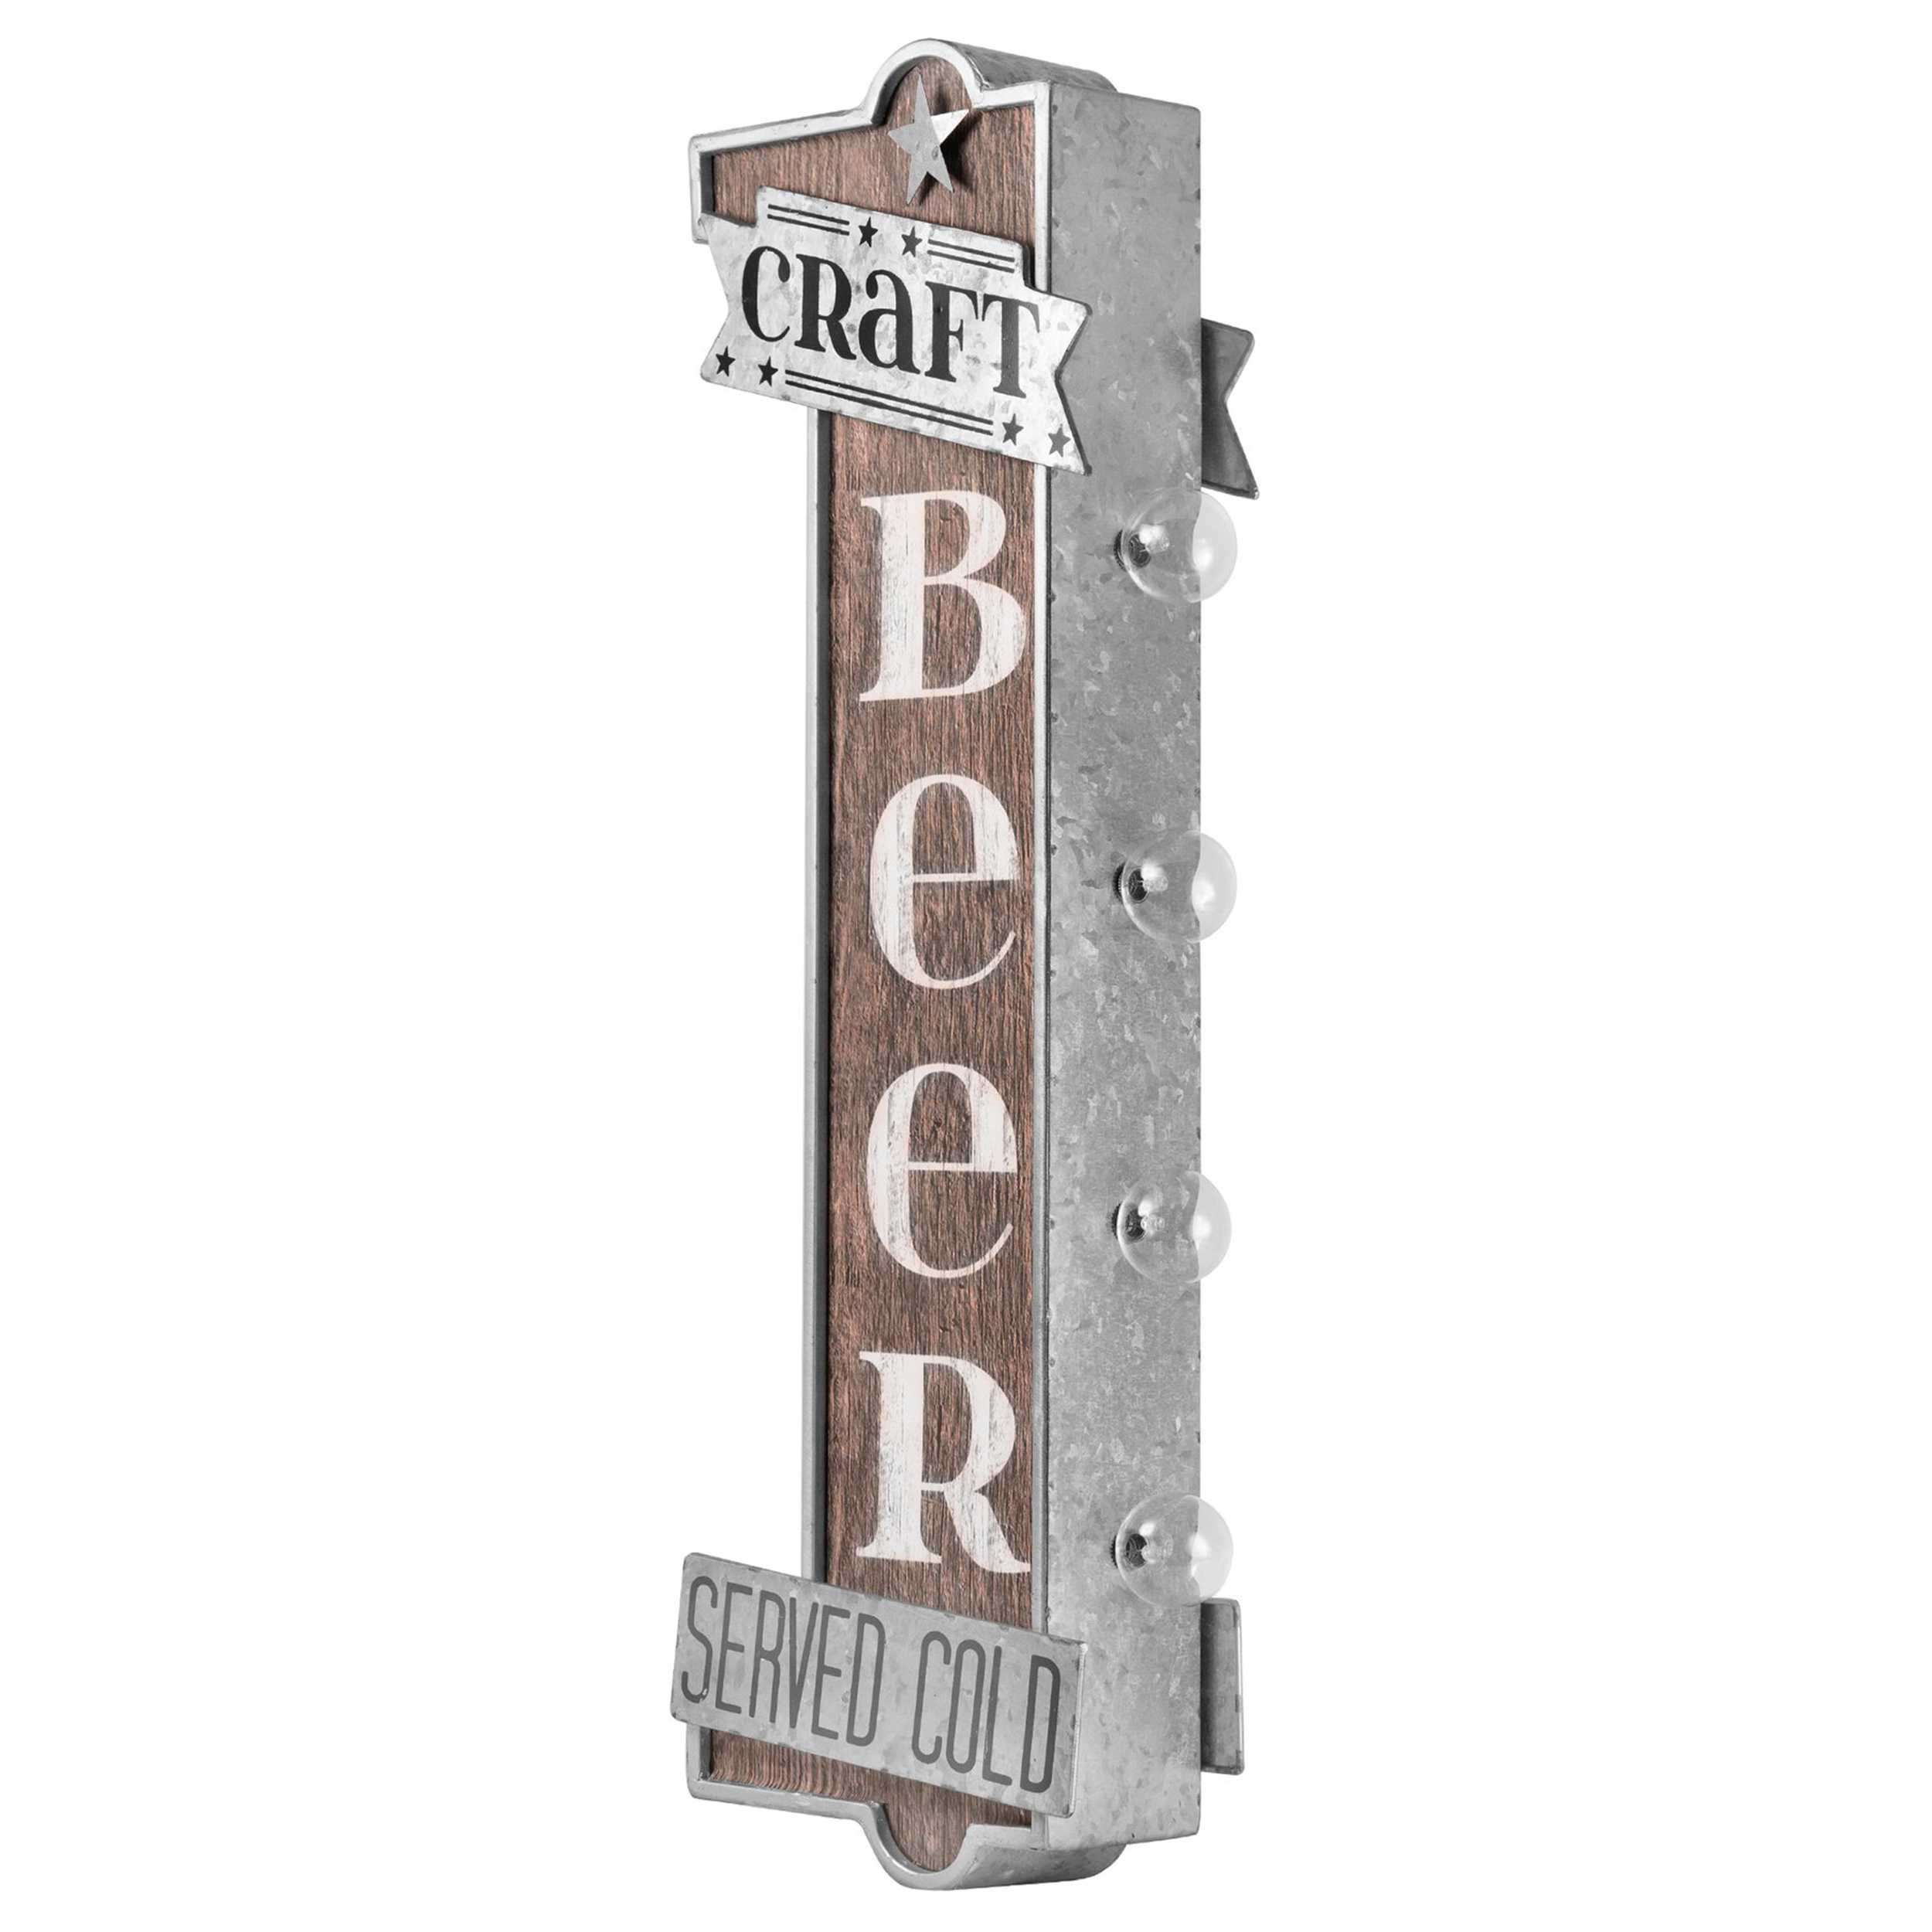 Vintage Two Sided Led Sign - Craft Beer